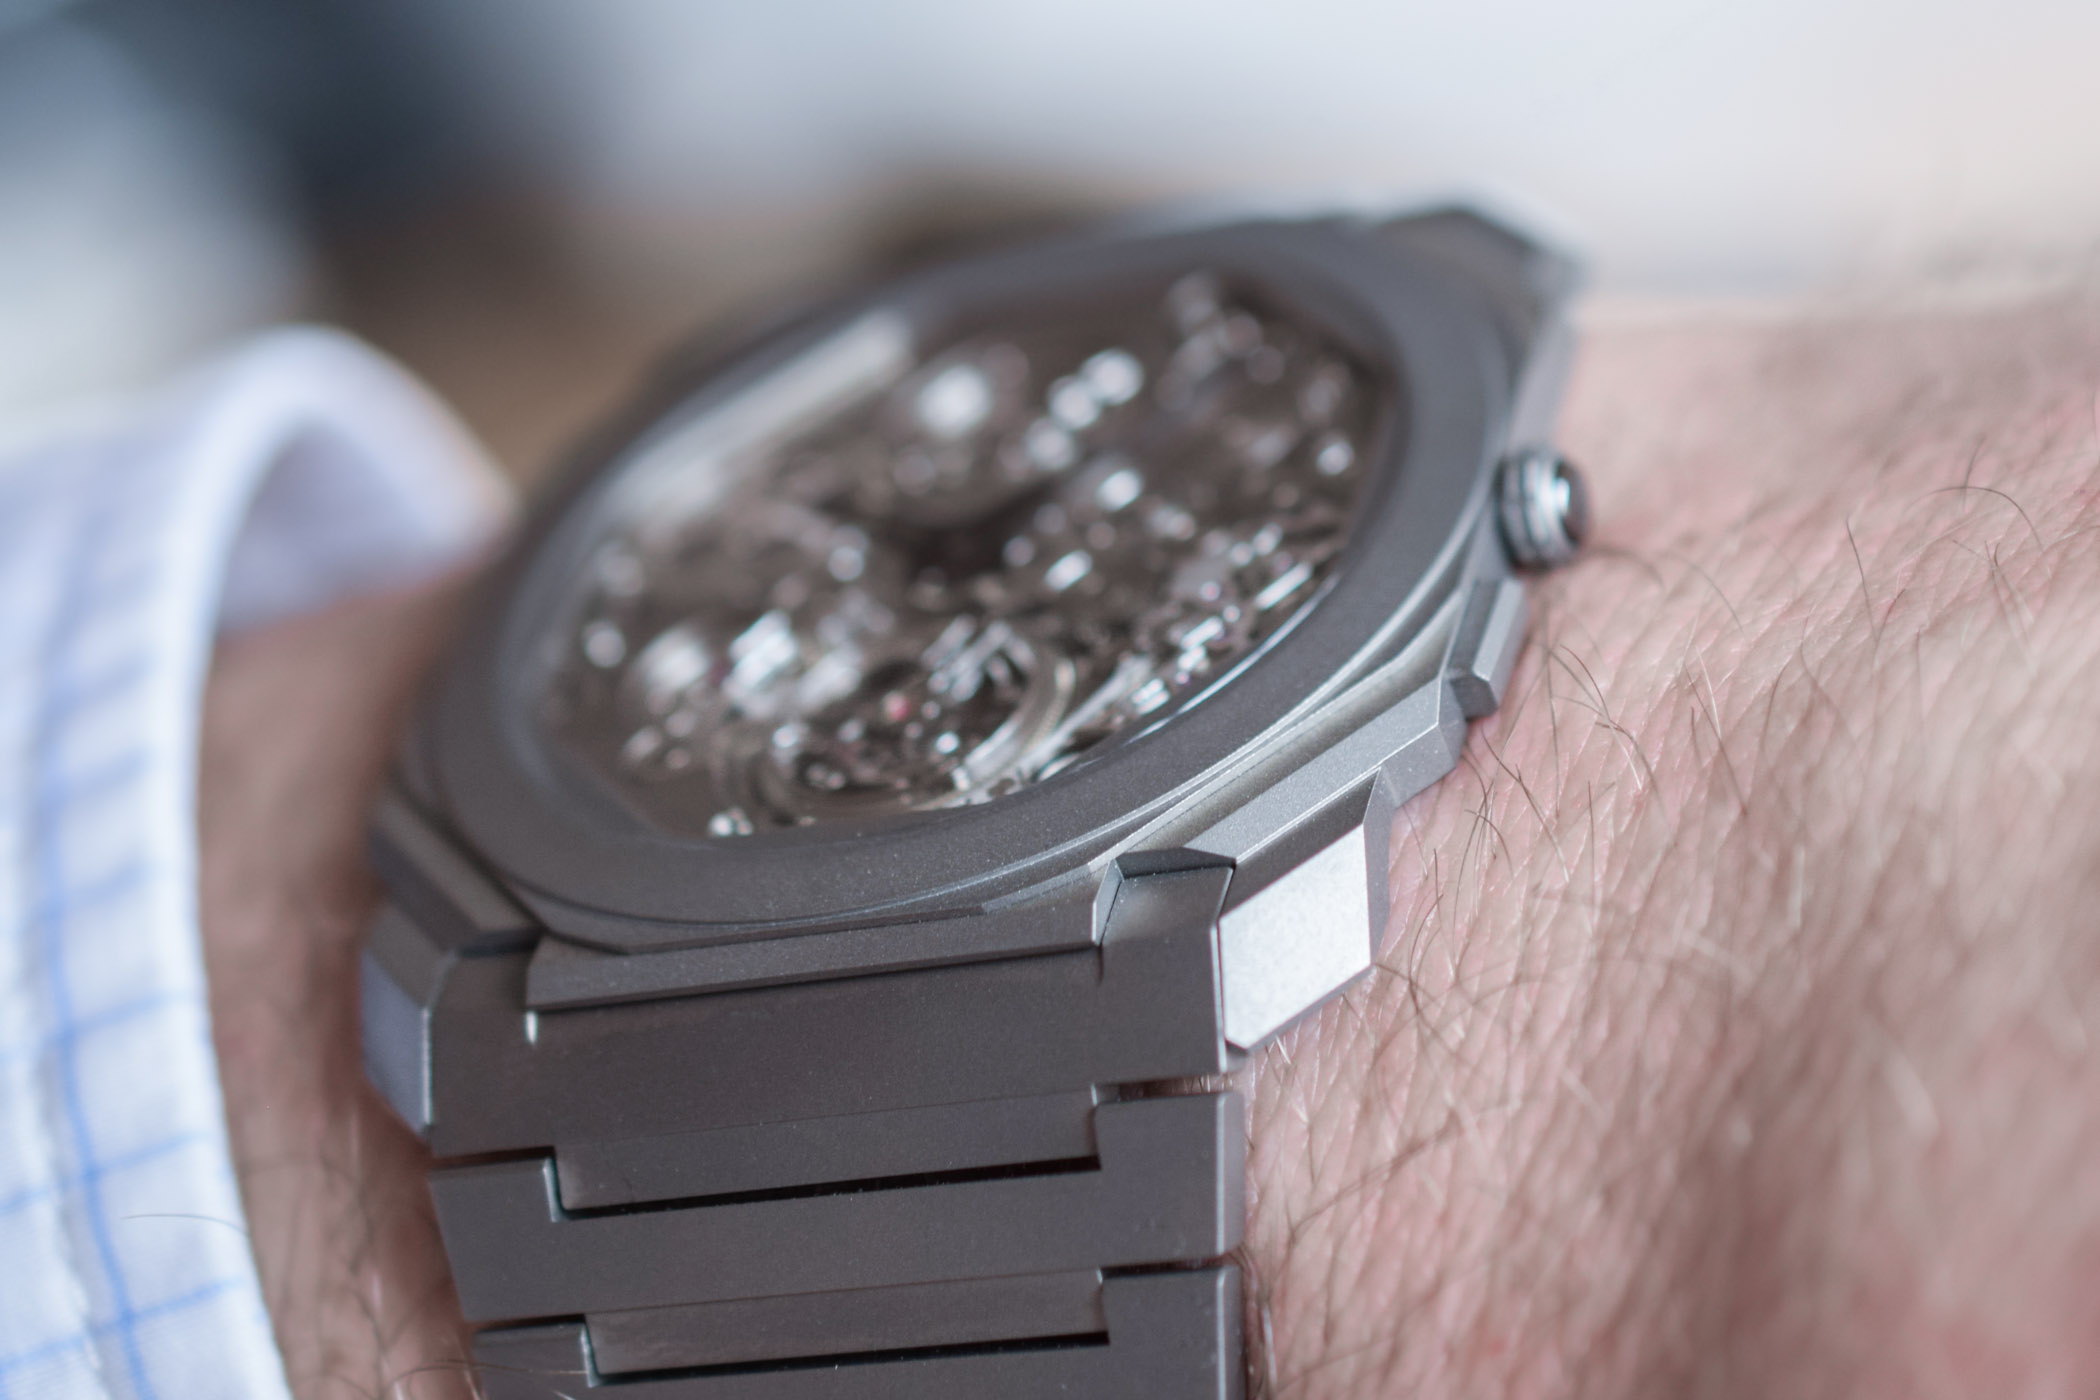 Bulgari Octo Finissimo Tourbillon Automatic - World's Thinnest Automatic Watch and Tourbillon - Baselworld 2018